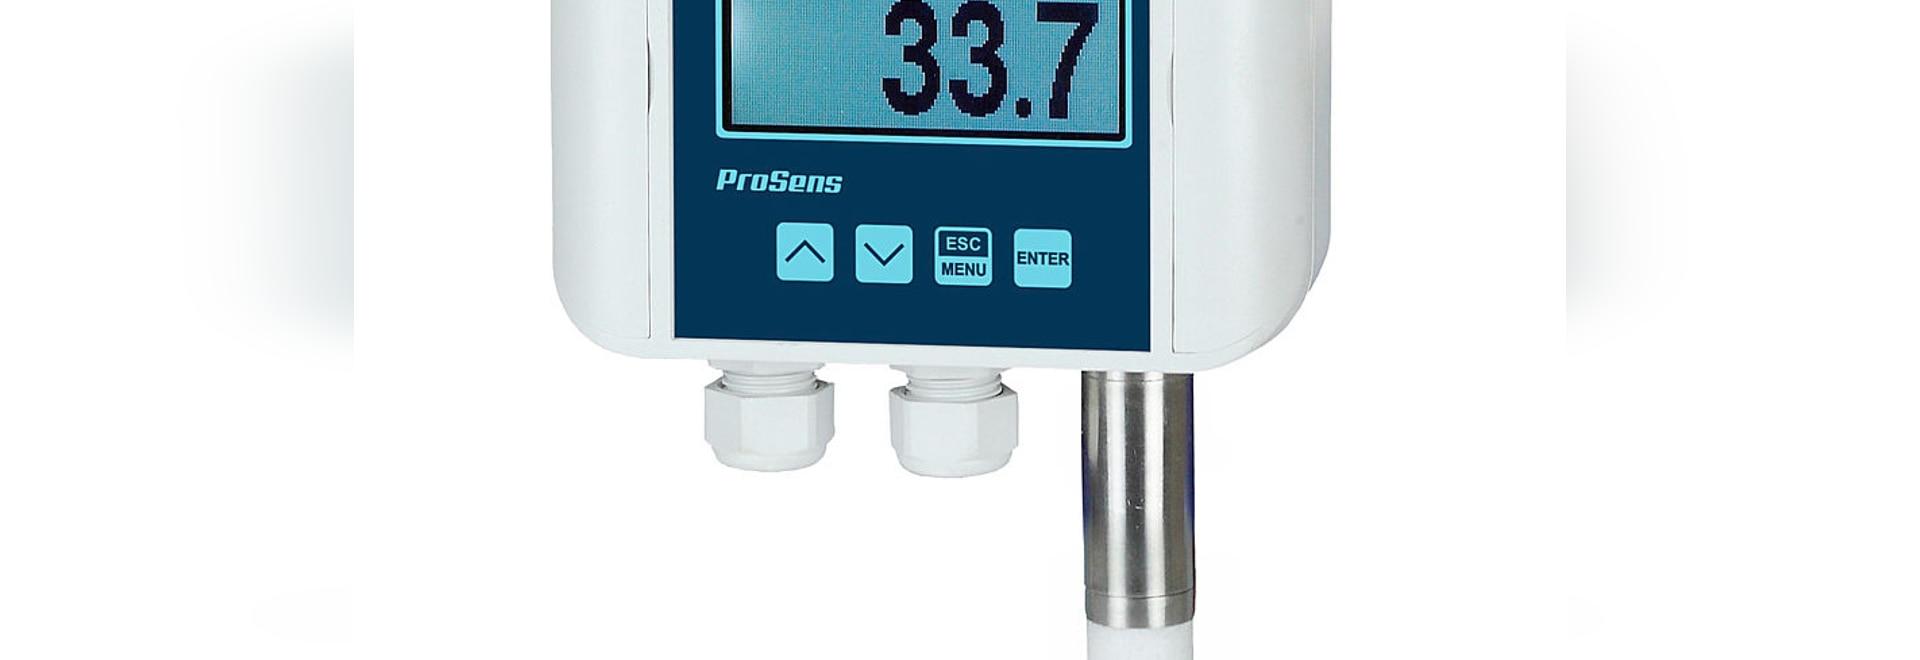 ProSense = Sensor + Messinstrument + Steuerpult